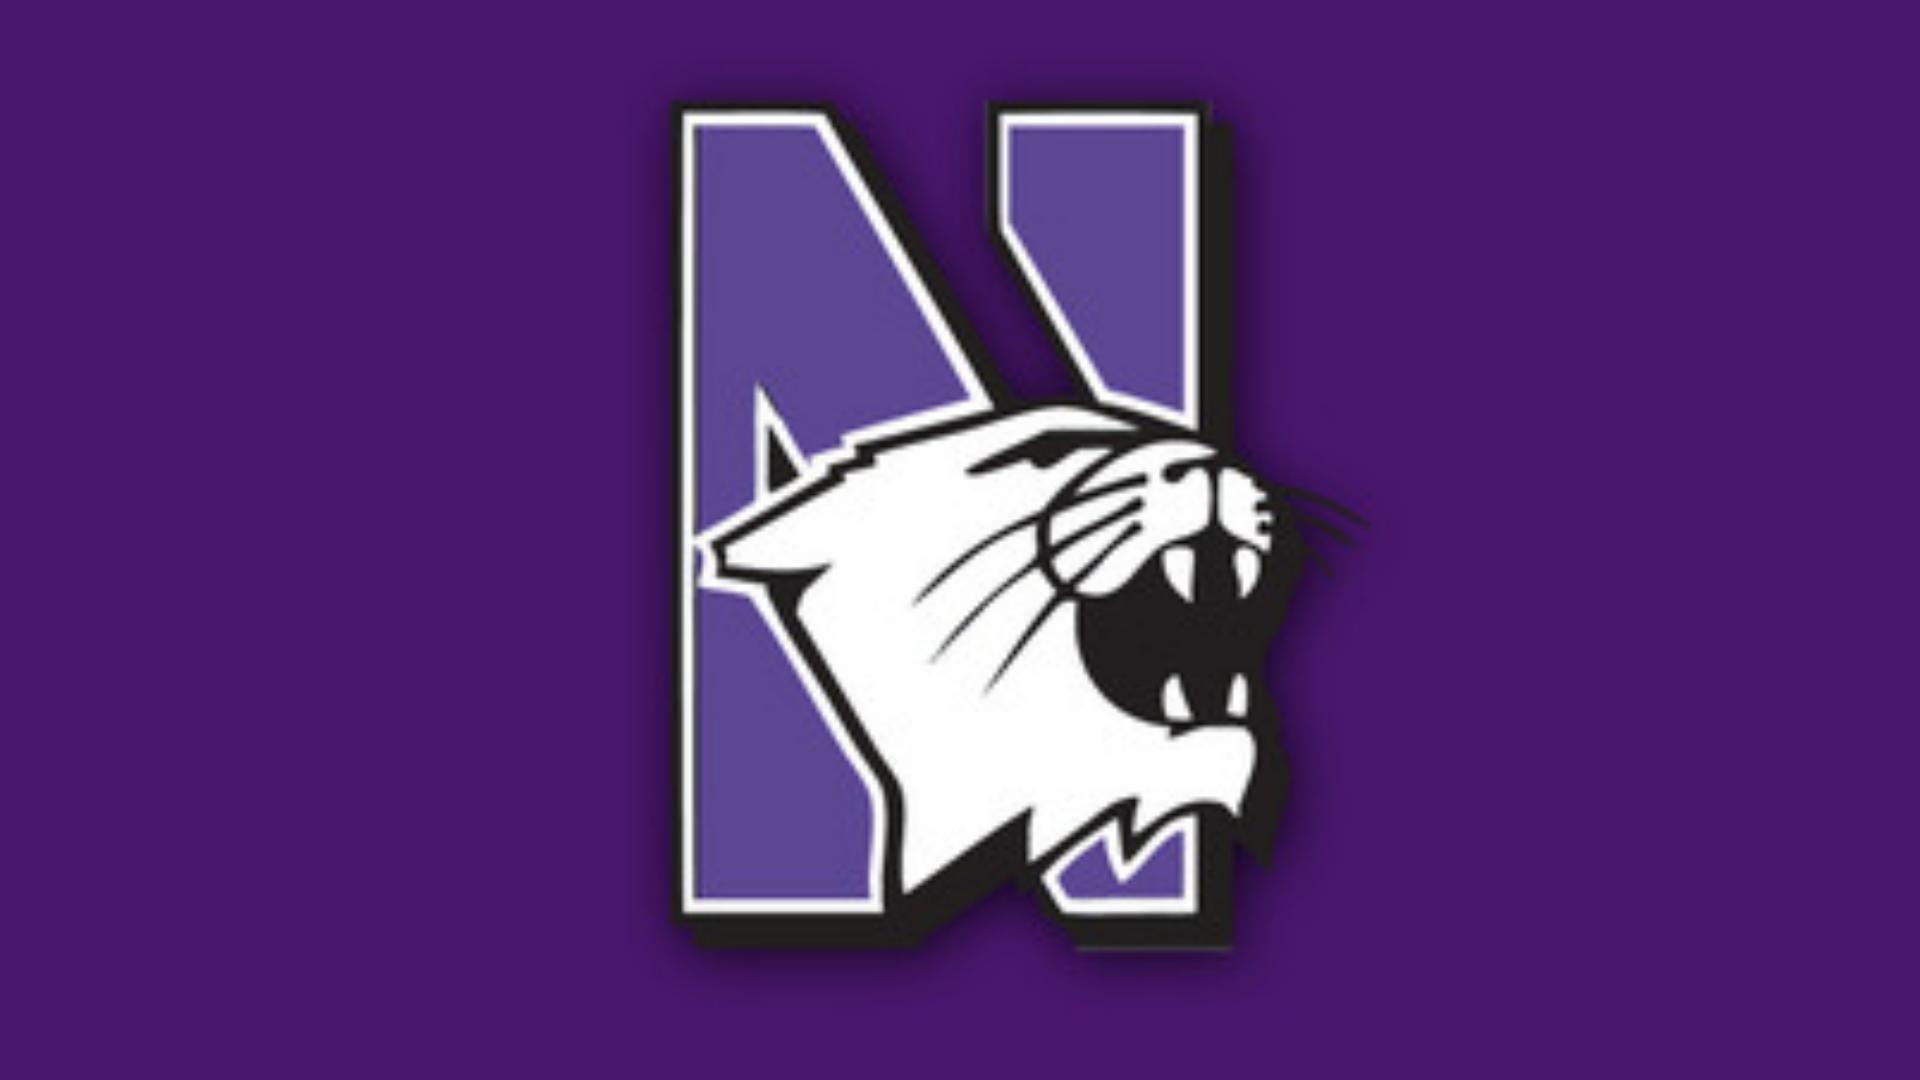 Northwestern-logo-ftr-getty-imagespng_1x2no74jx2i9o1qiej3q2miqz8